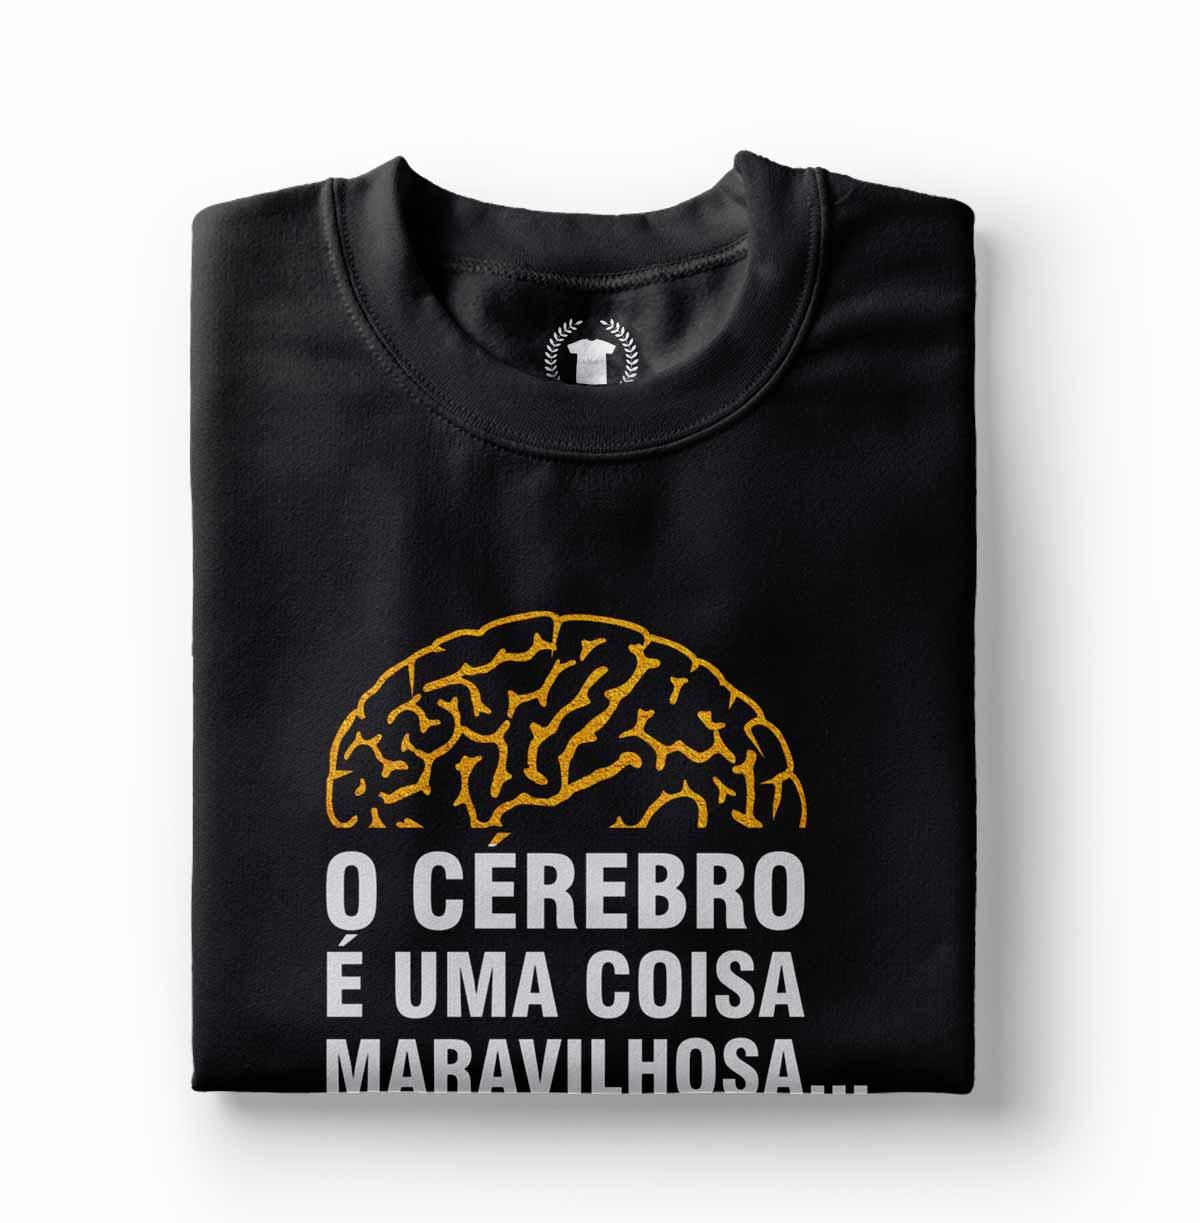 Camiseta camisa divertida todos deveriam ter um cerebro